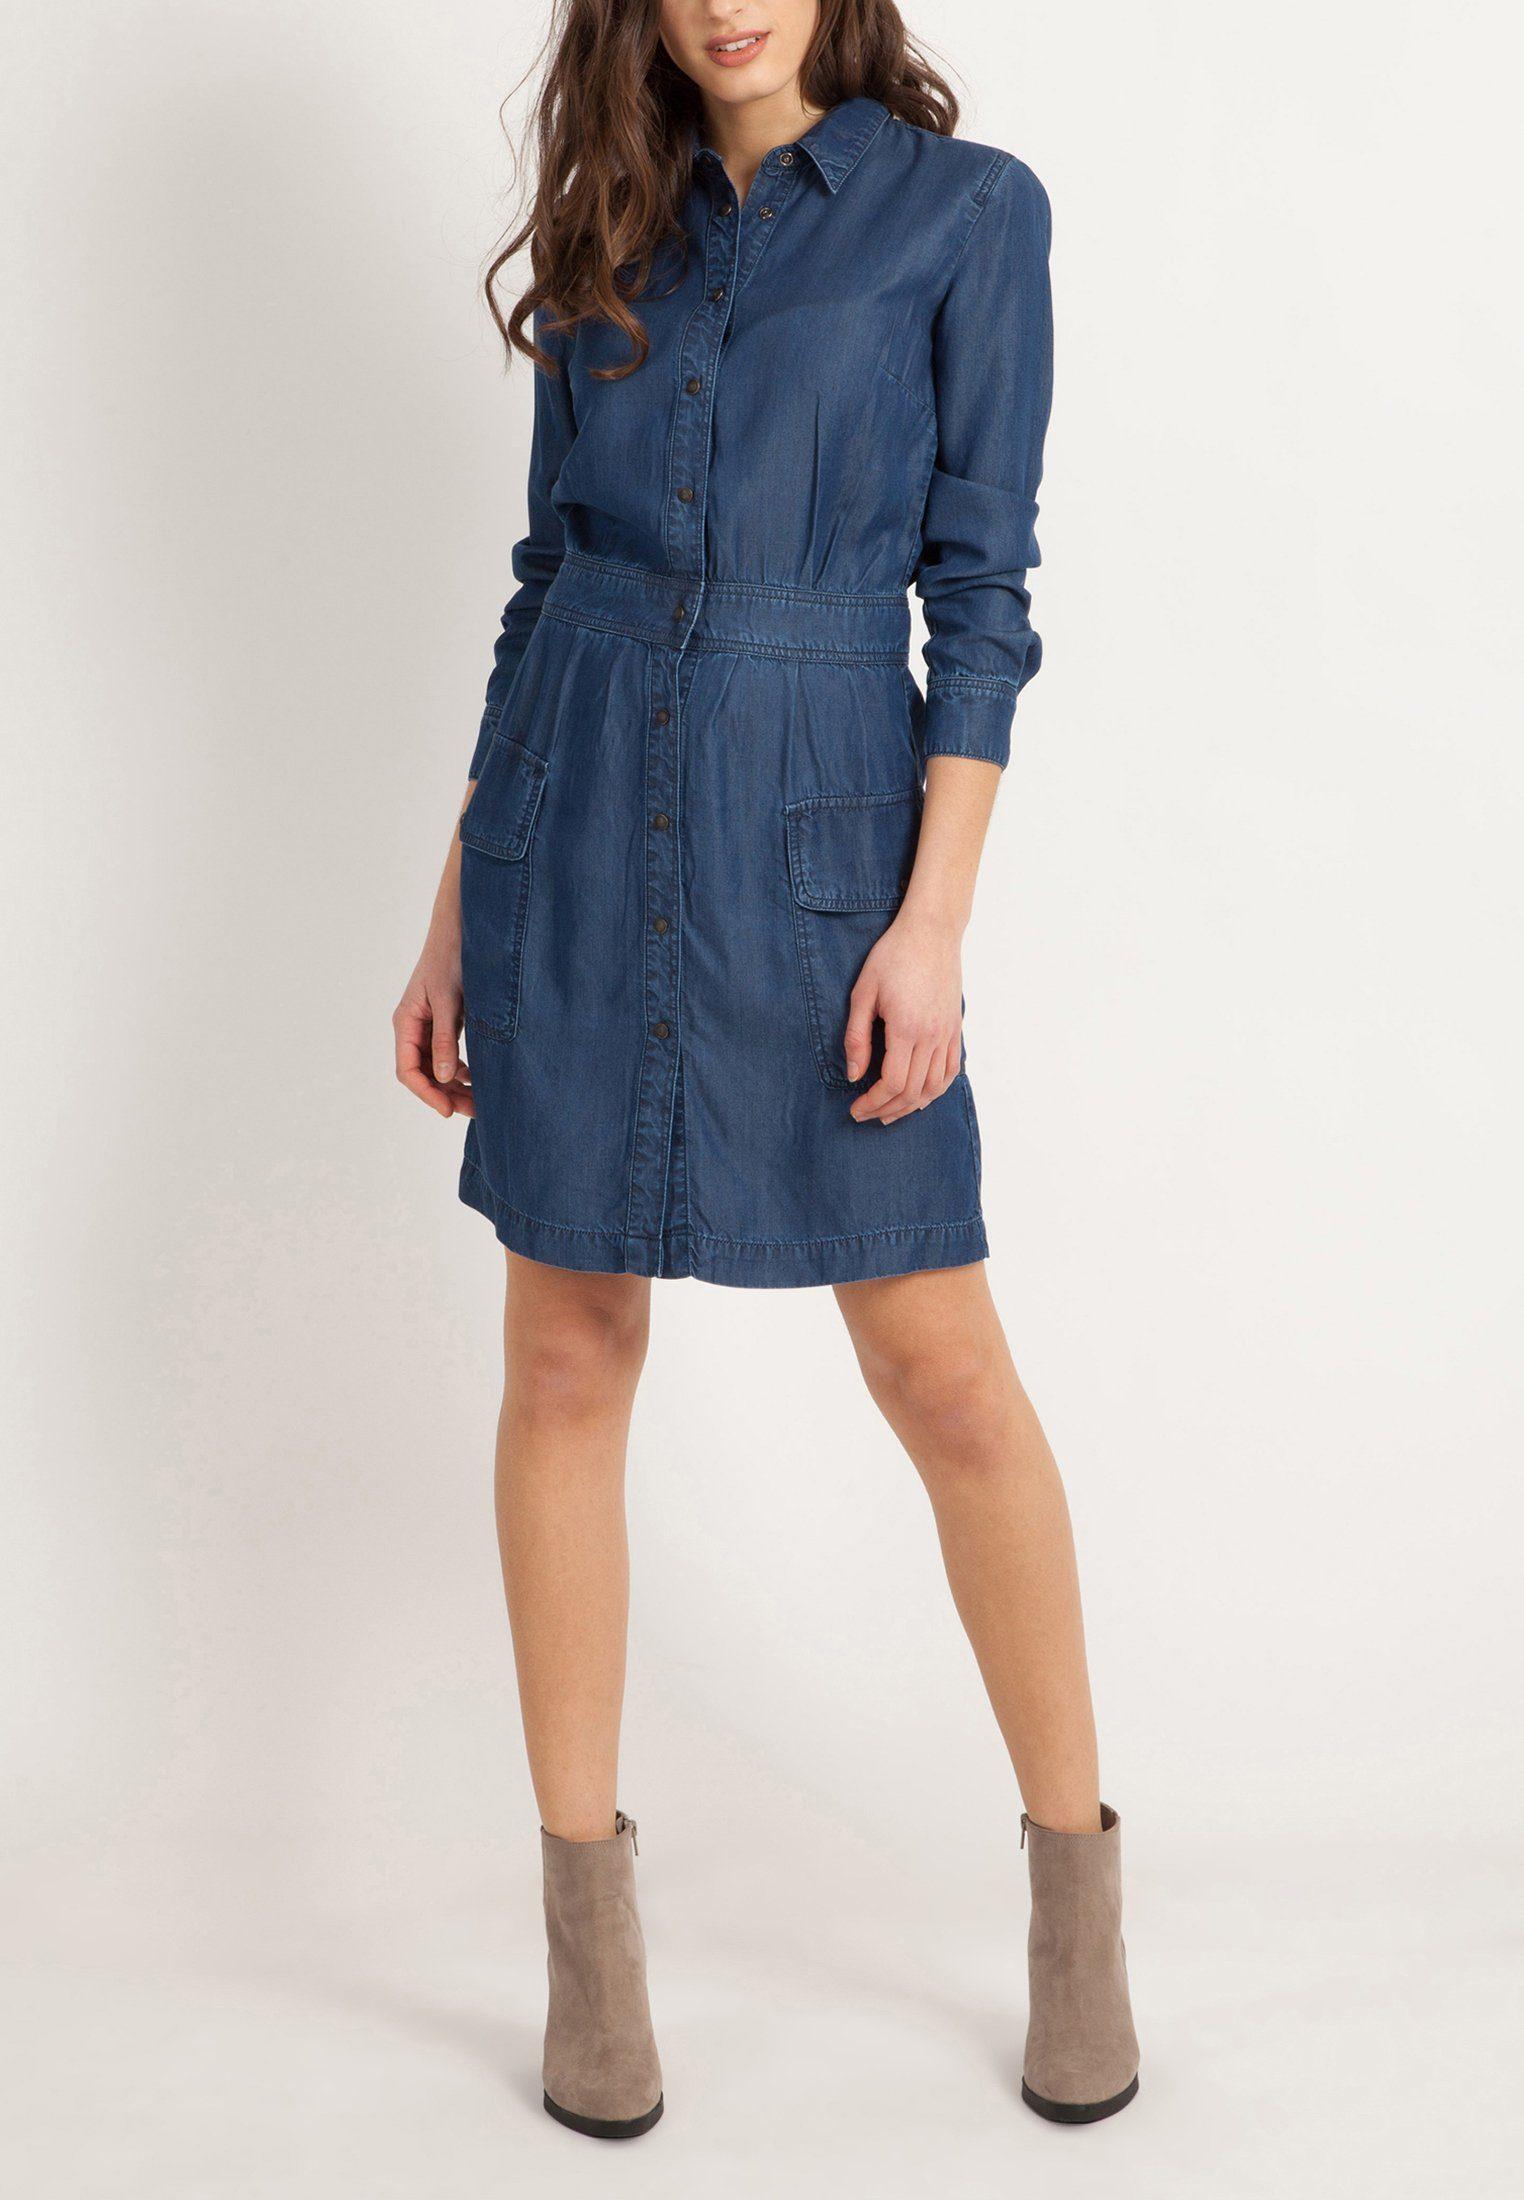 Mavi Jeanskleid »DENIM DRESS« Strukturierte Form